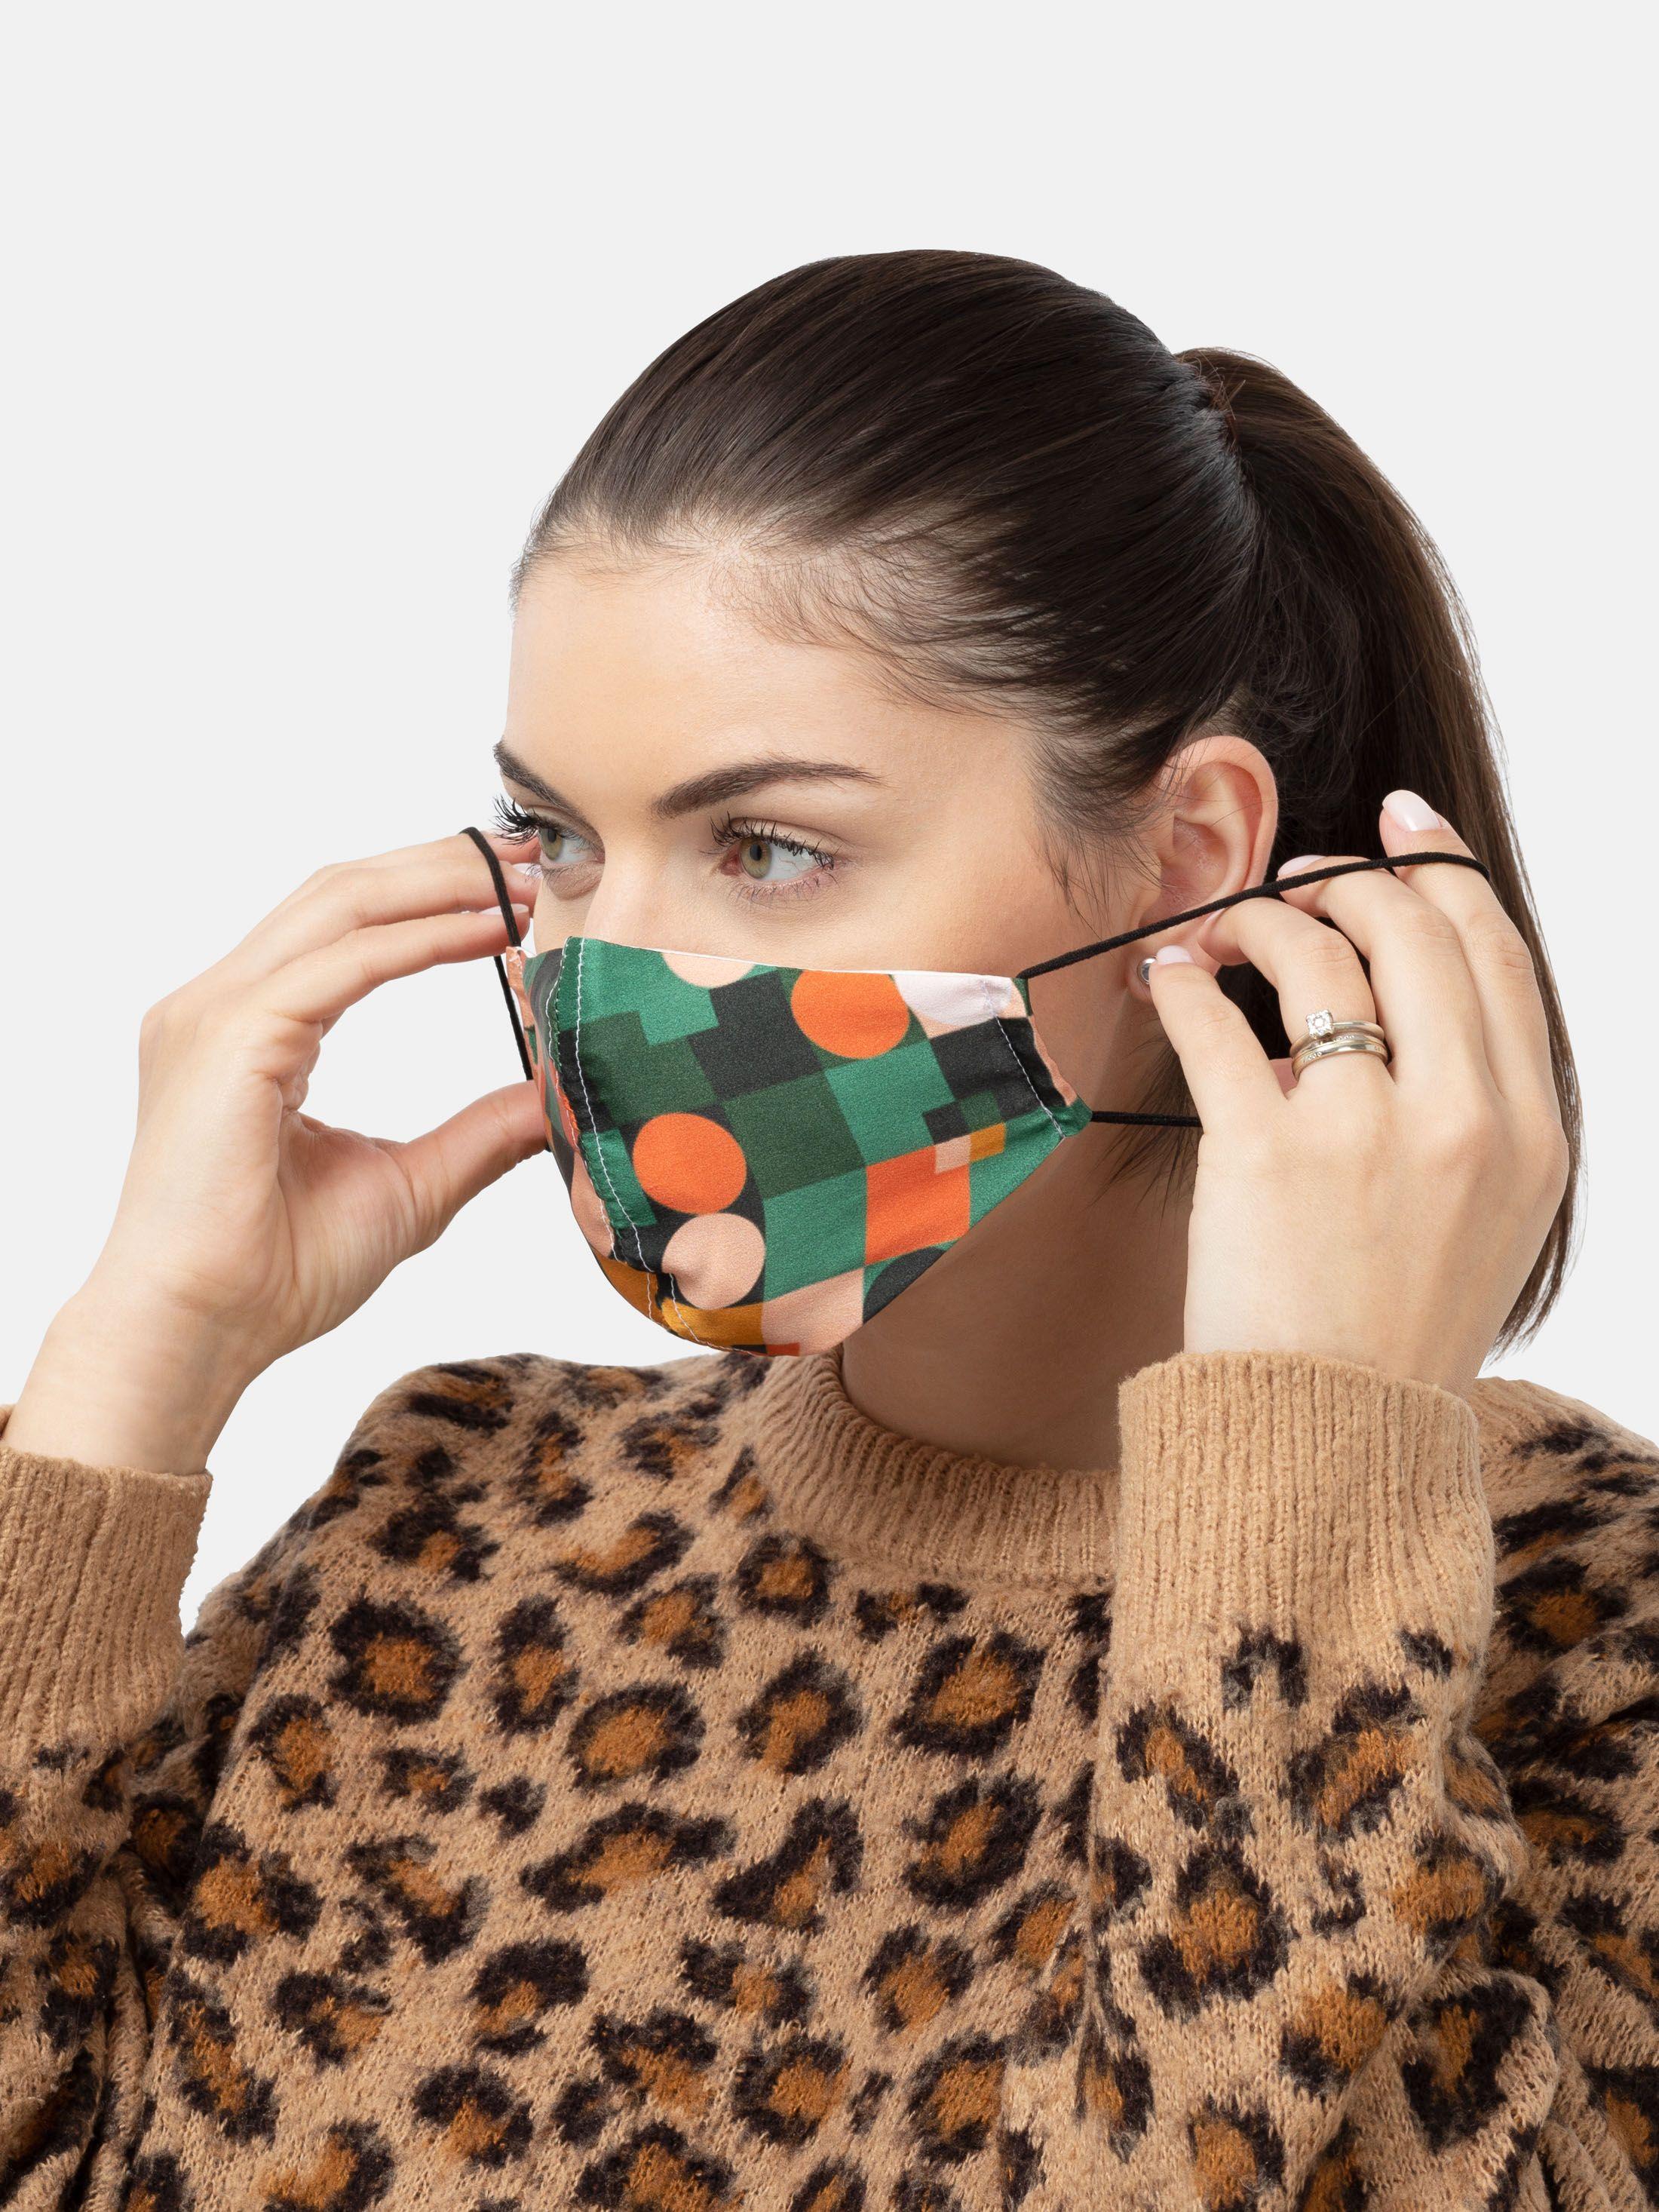 Designa din egen ansiktsmask